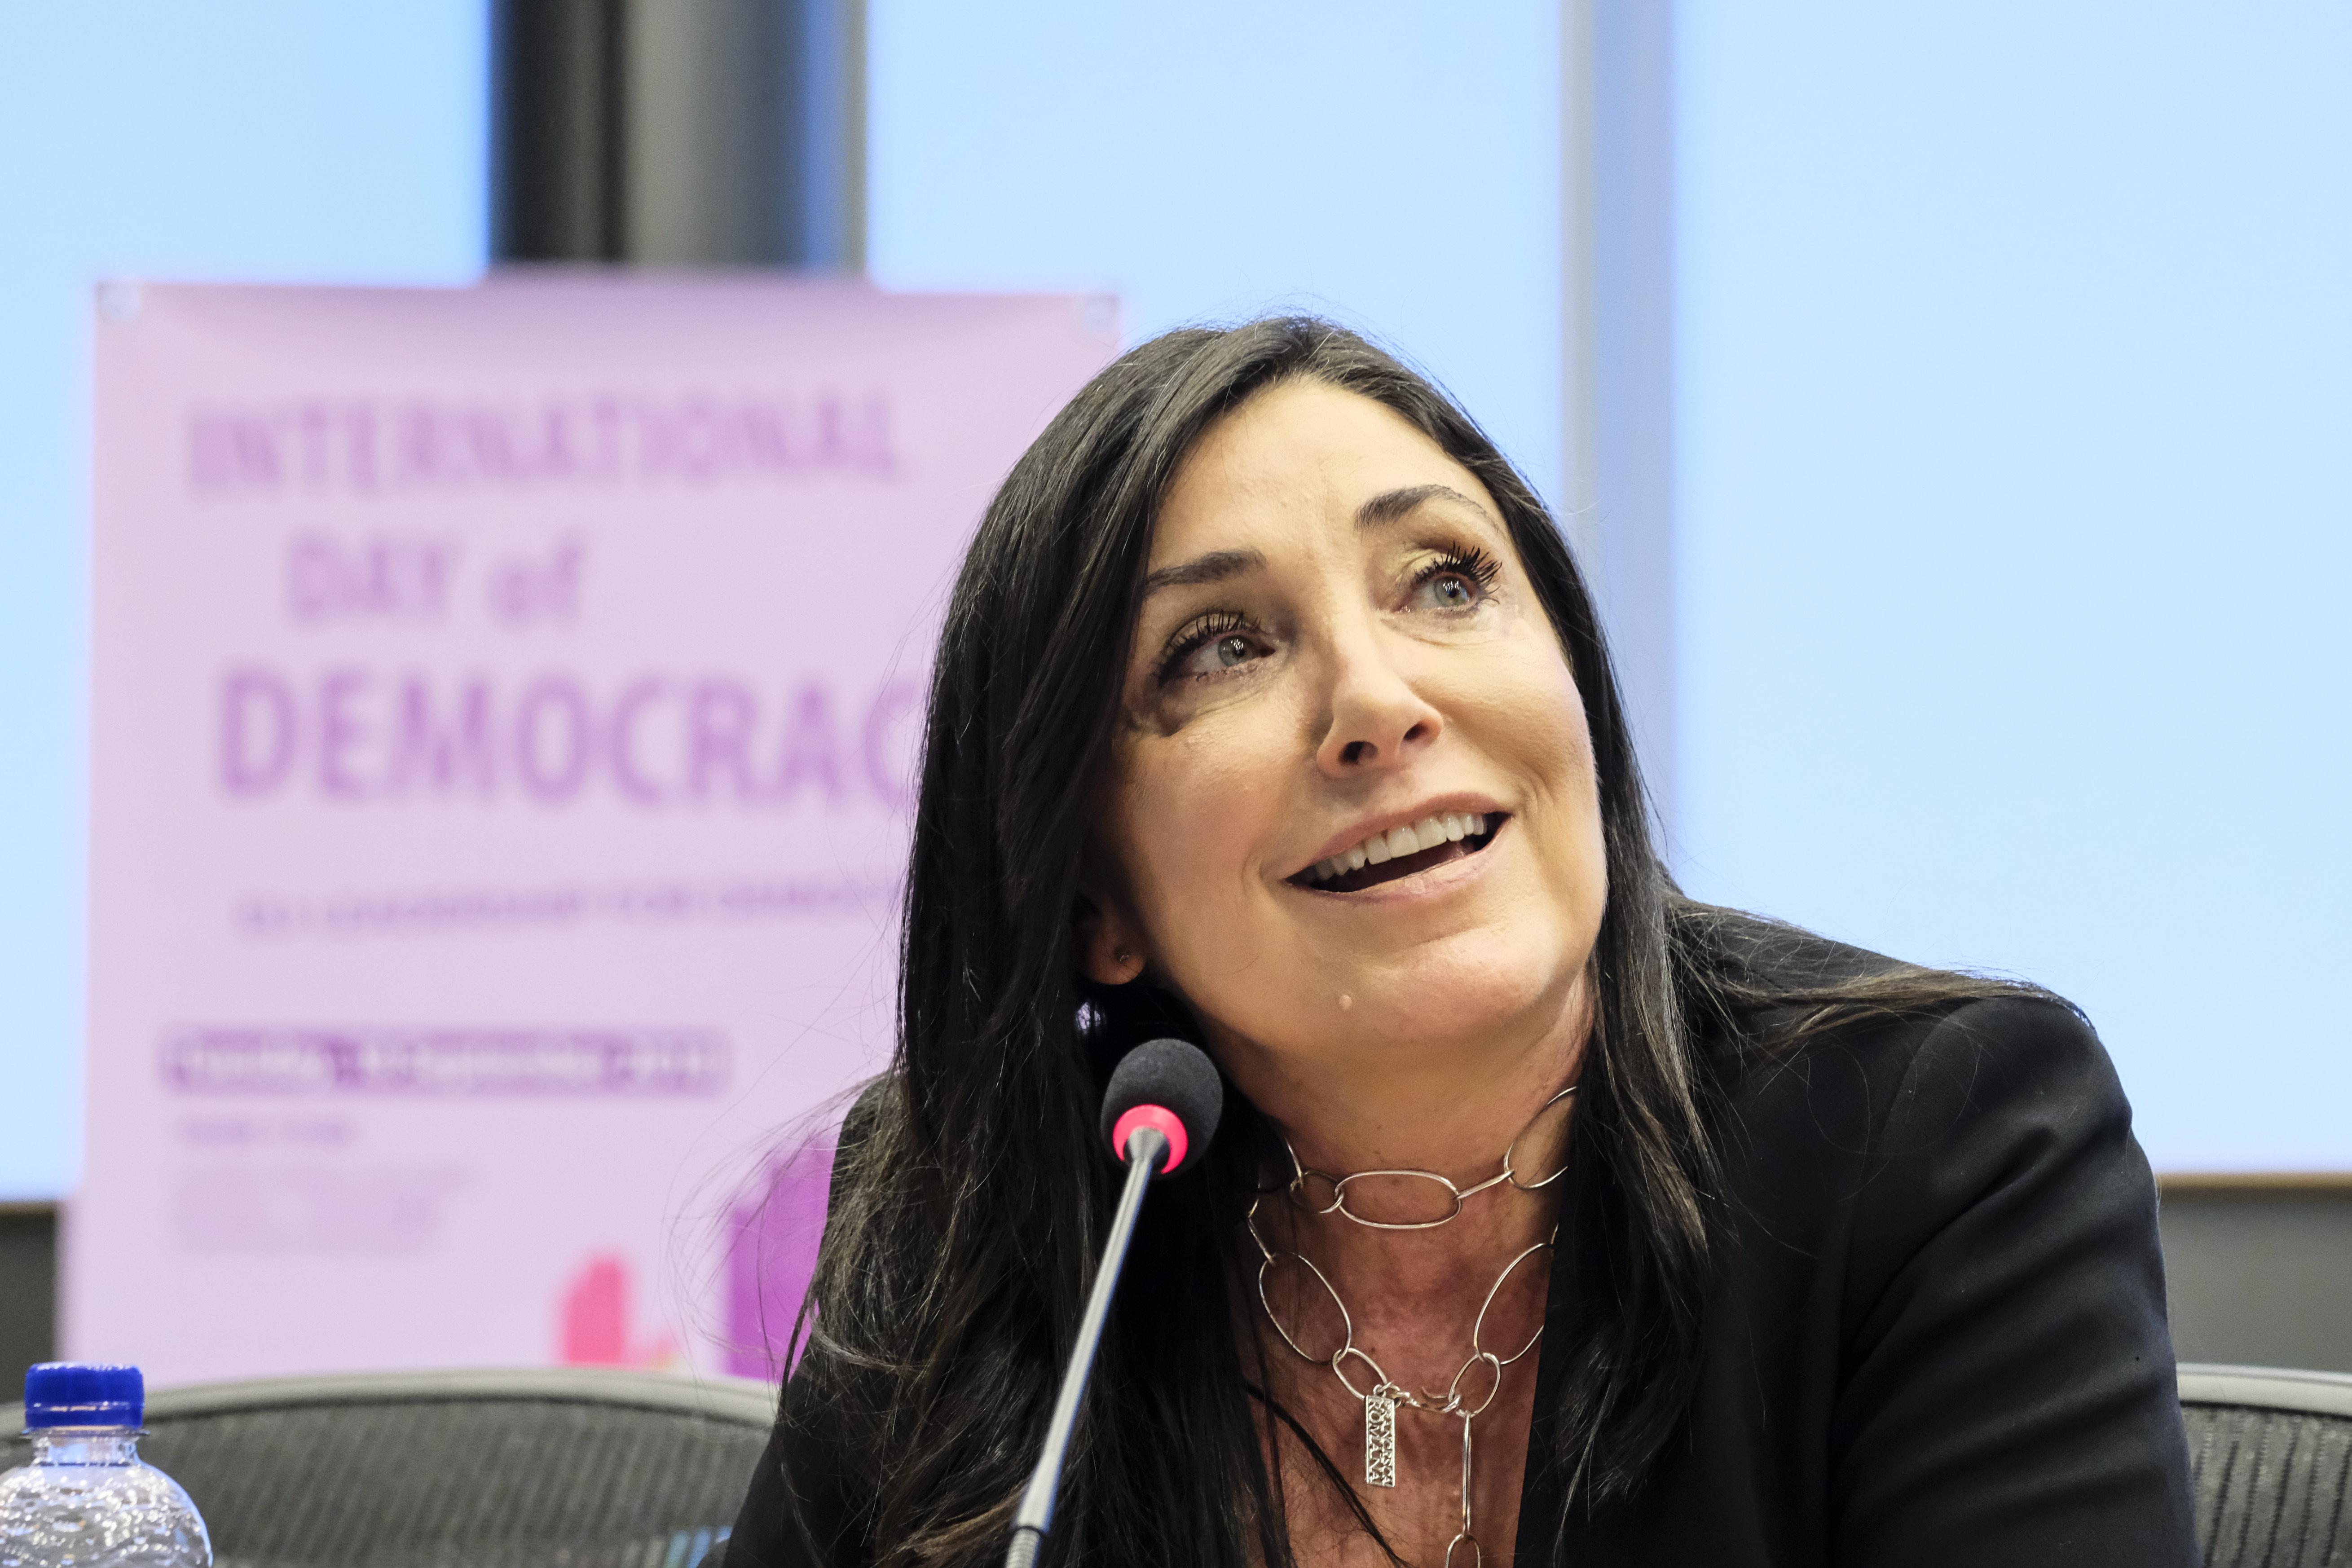 International Day of Democracy 2018: EU Leadership for Democracy